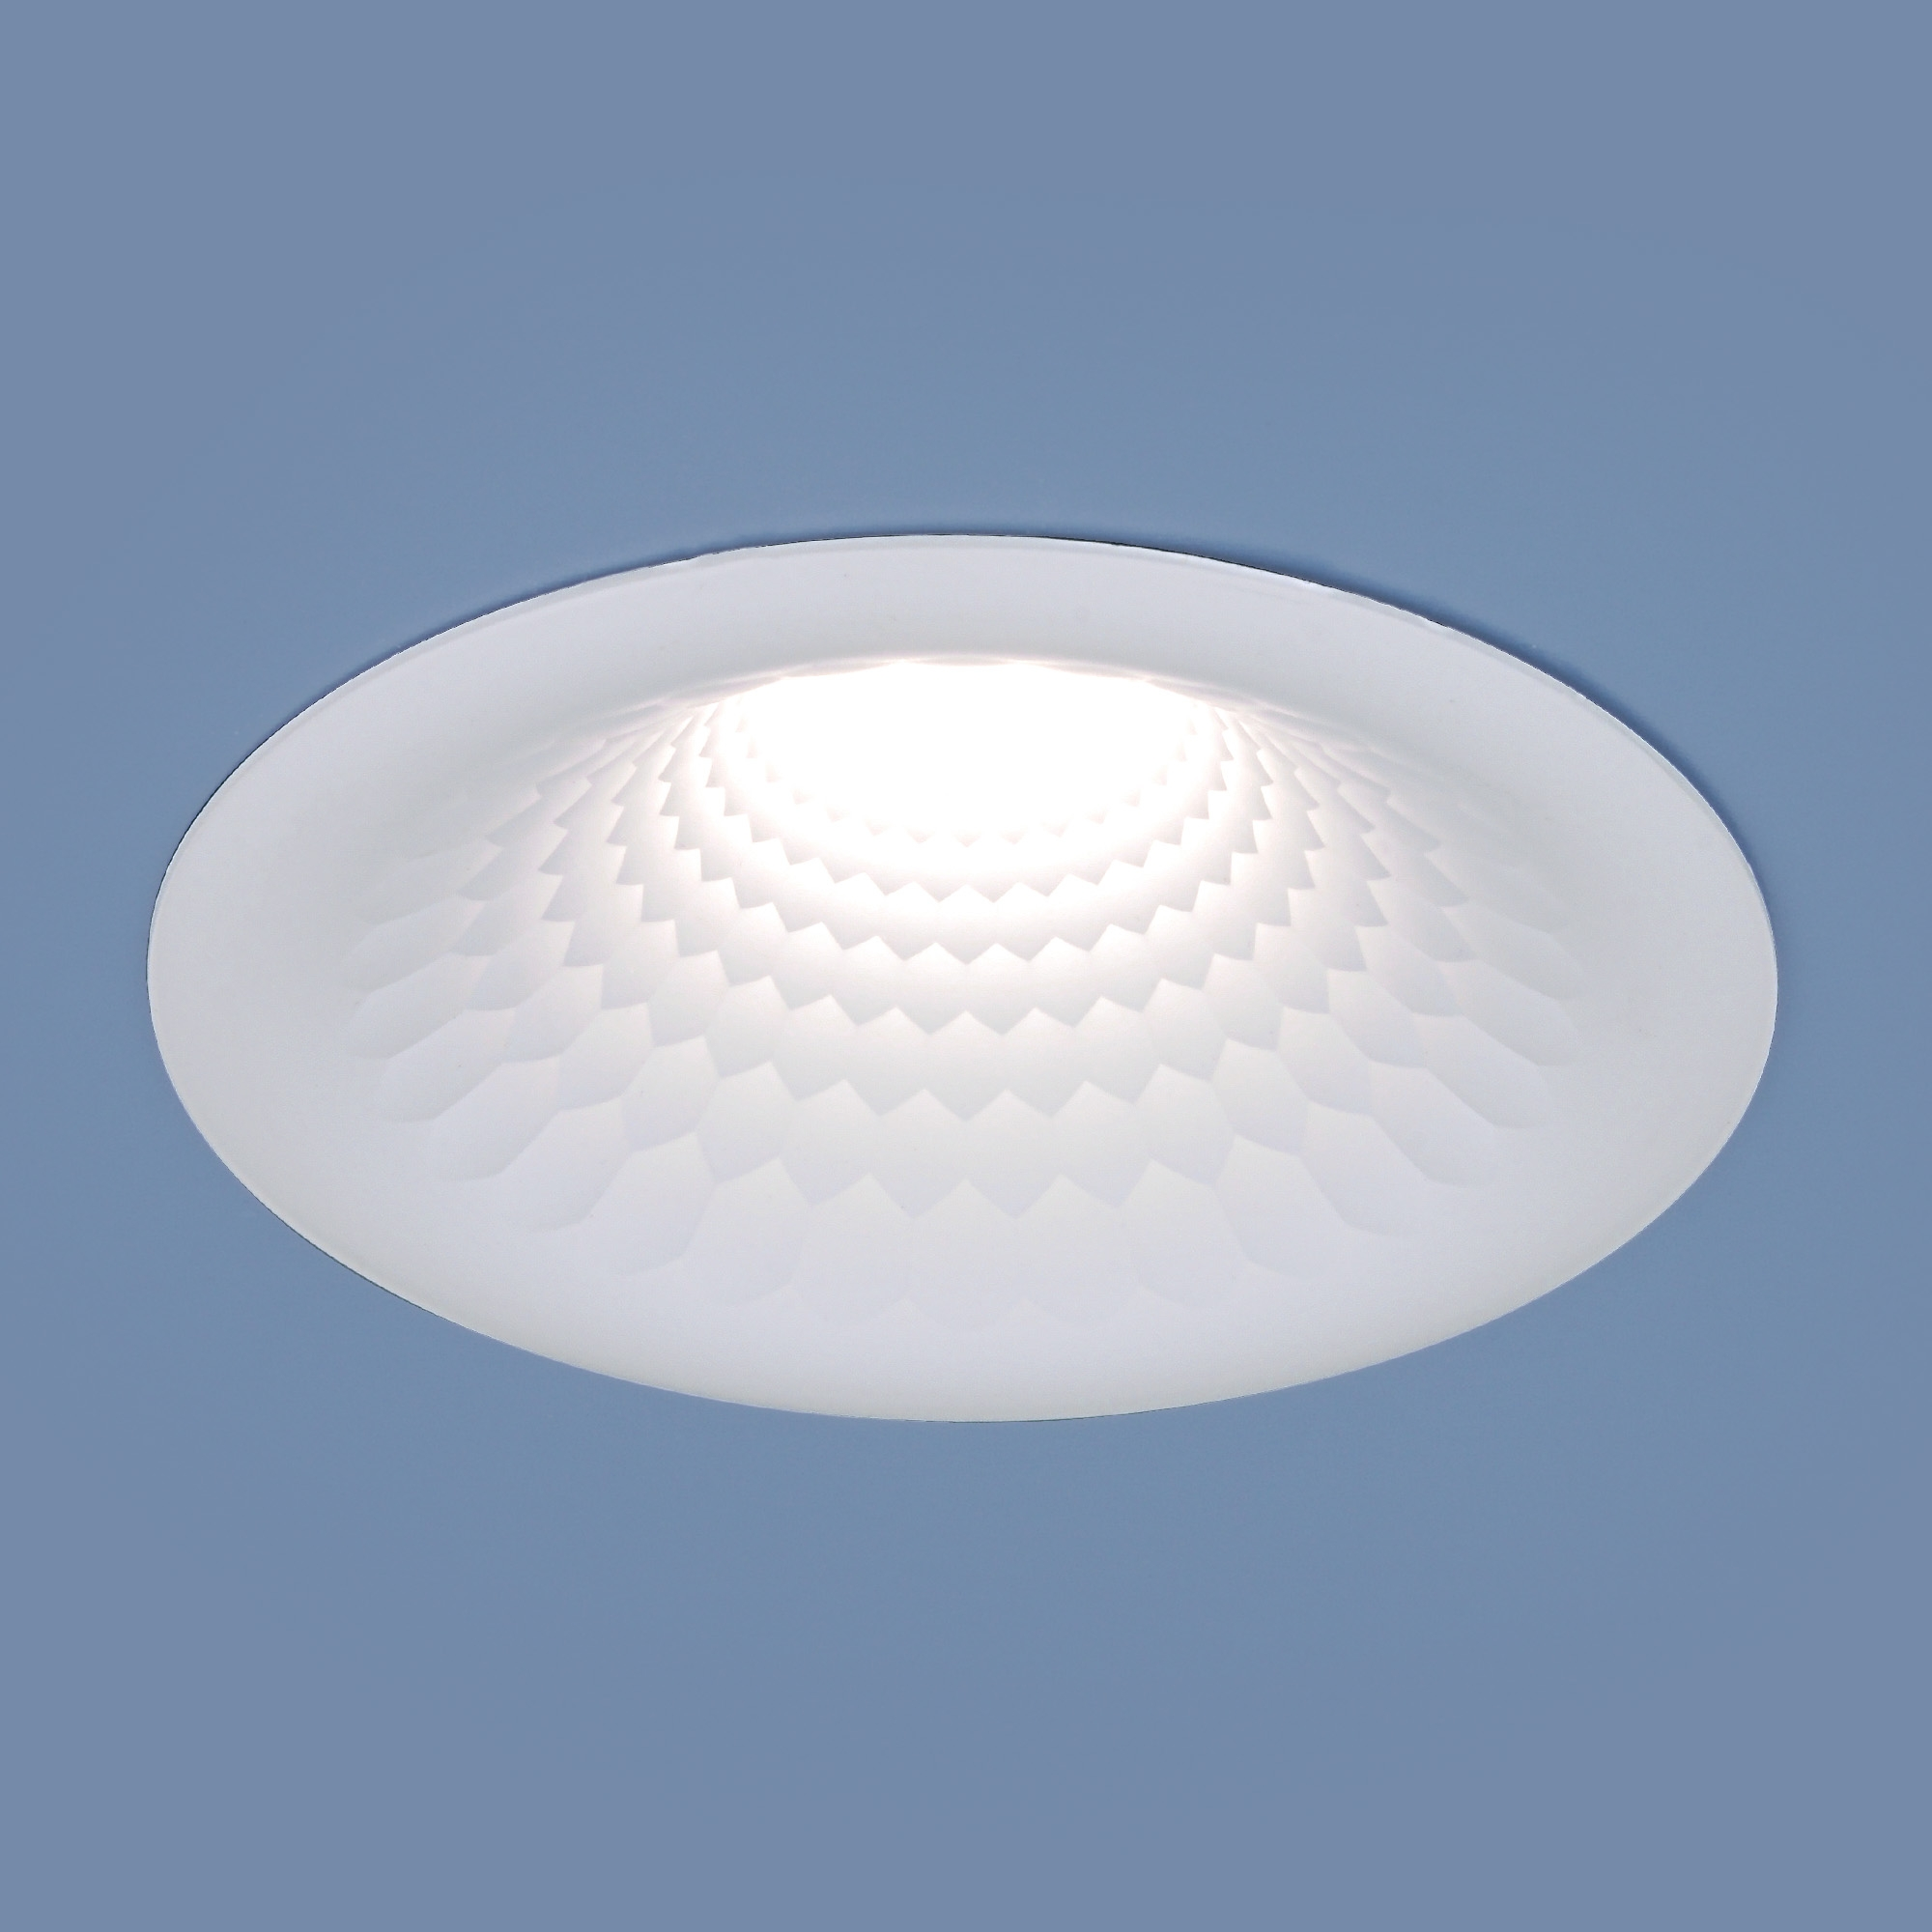 9905 LED 7W WH белый Встраиваемый точечный LED светильник Elektrostandard